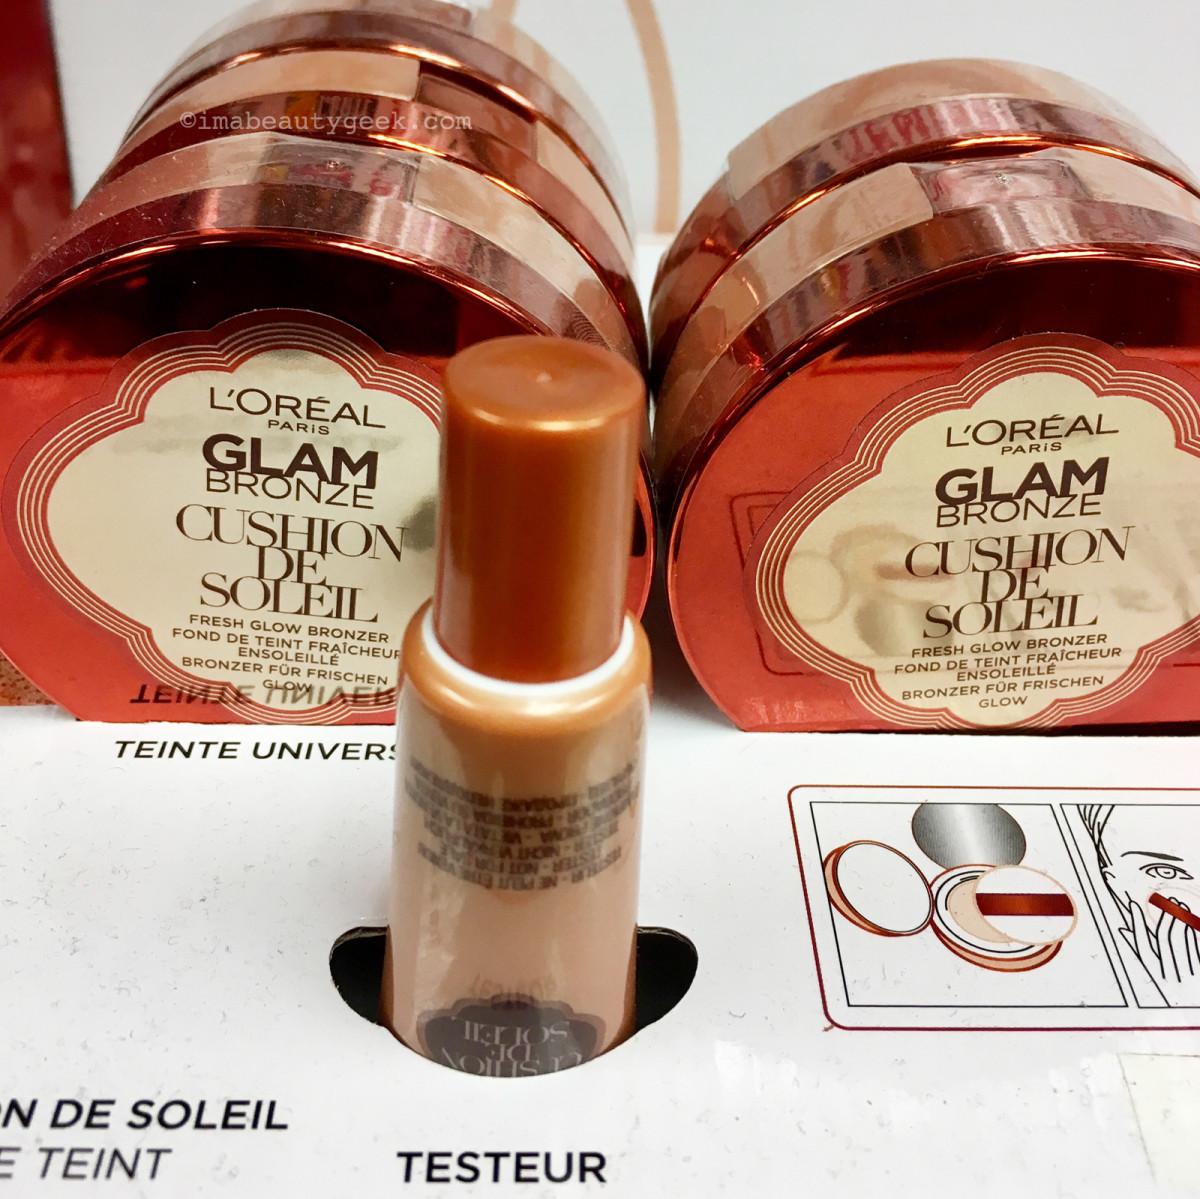 L'Oreal Paris Glam Bronze Cushion de Soleil tester at Monoprix in Paris..